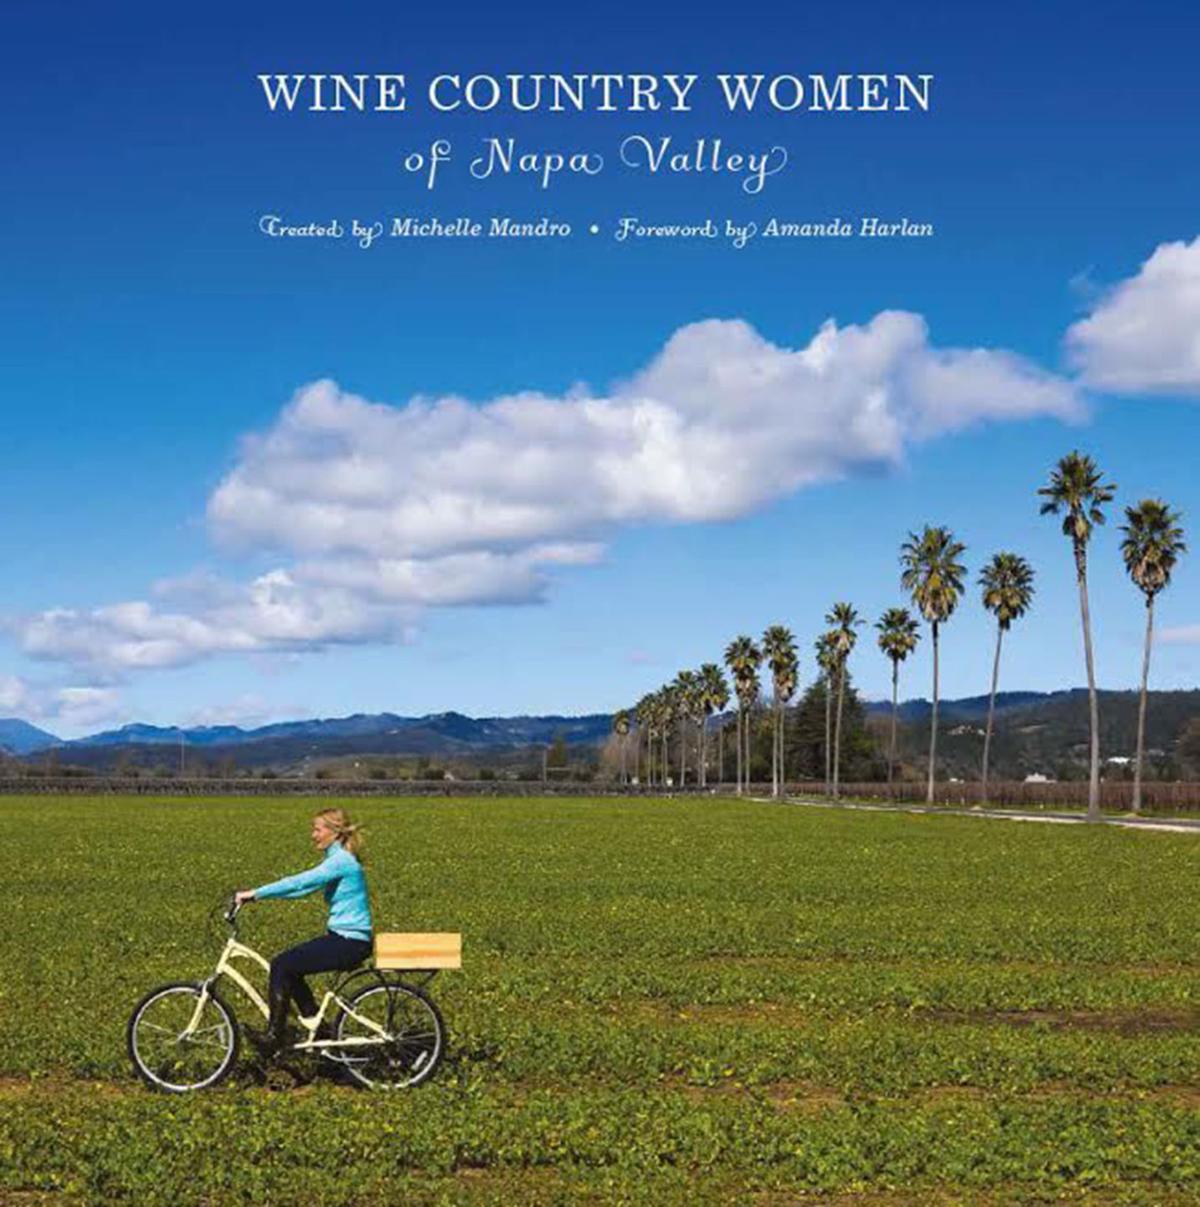 092217-nvr-fea-winecountrywomenCover